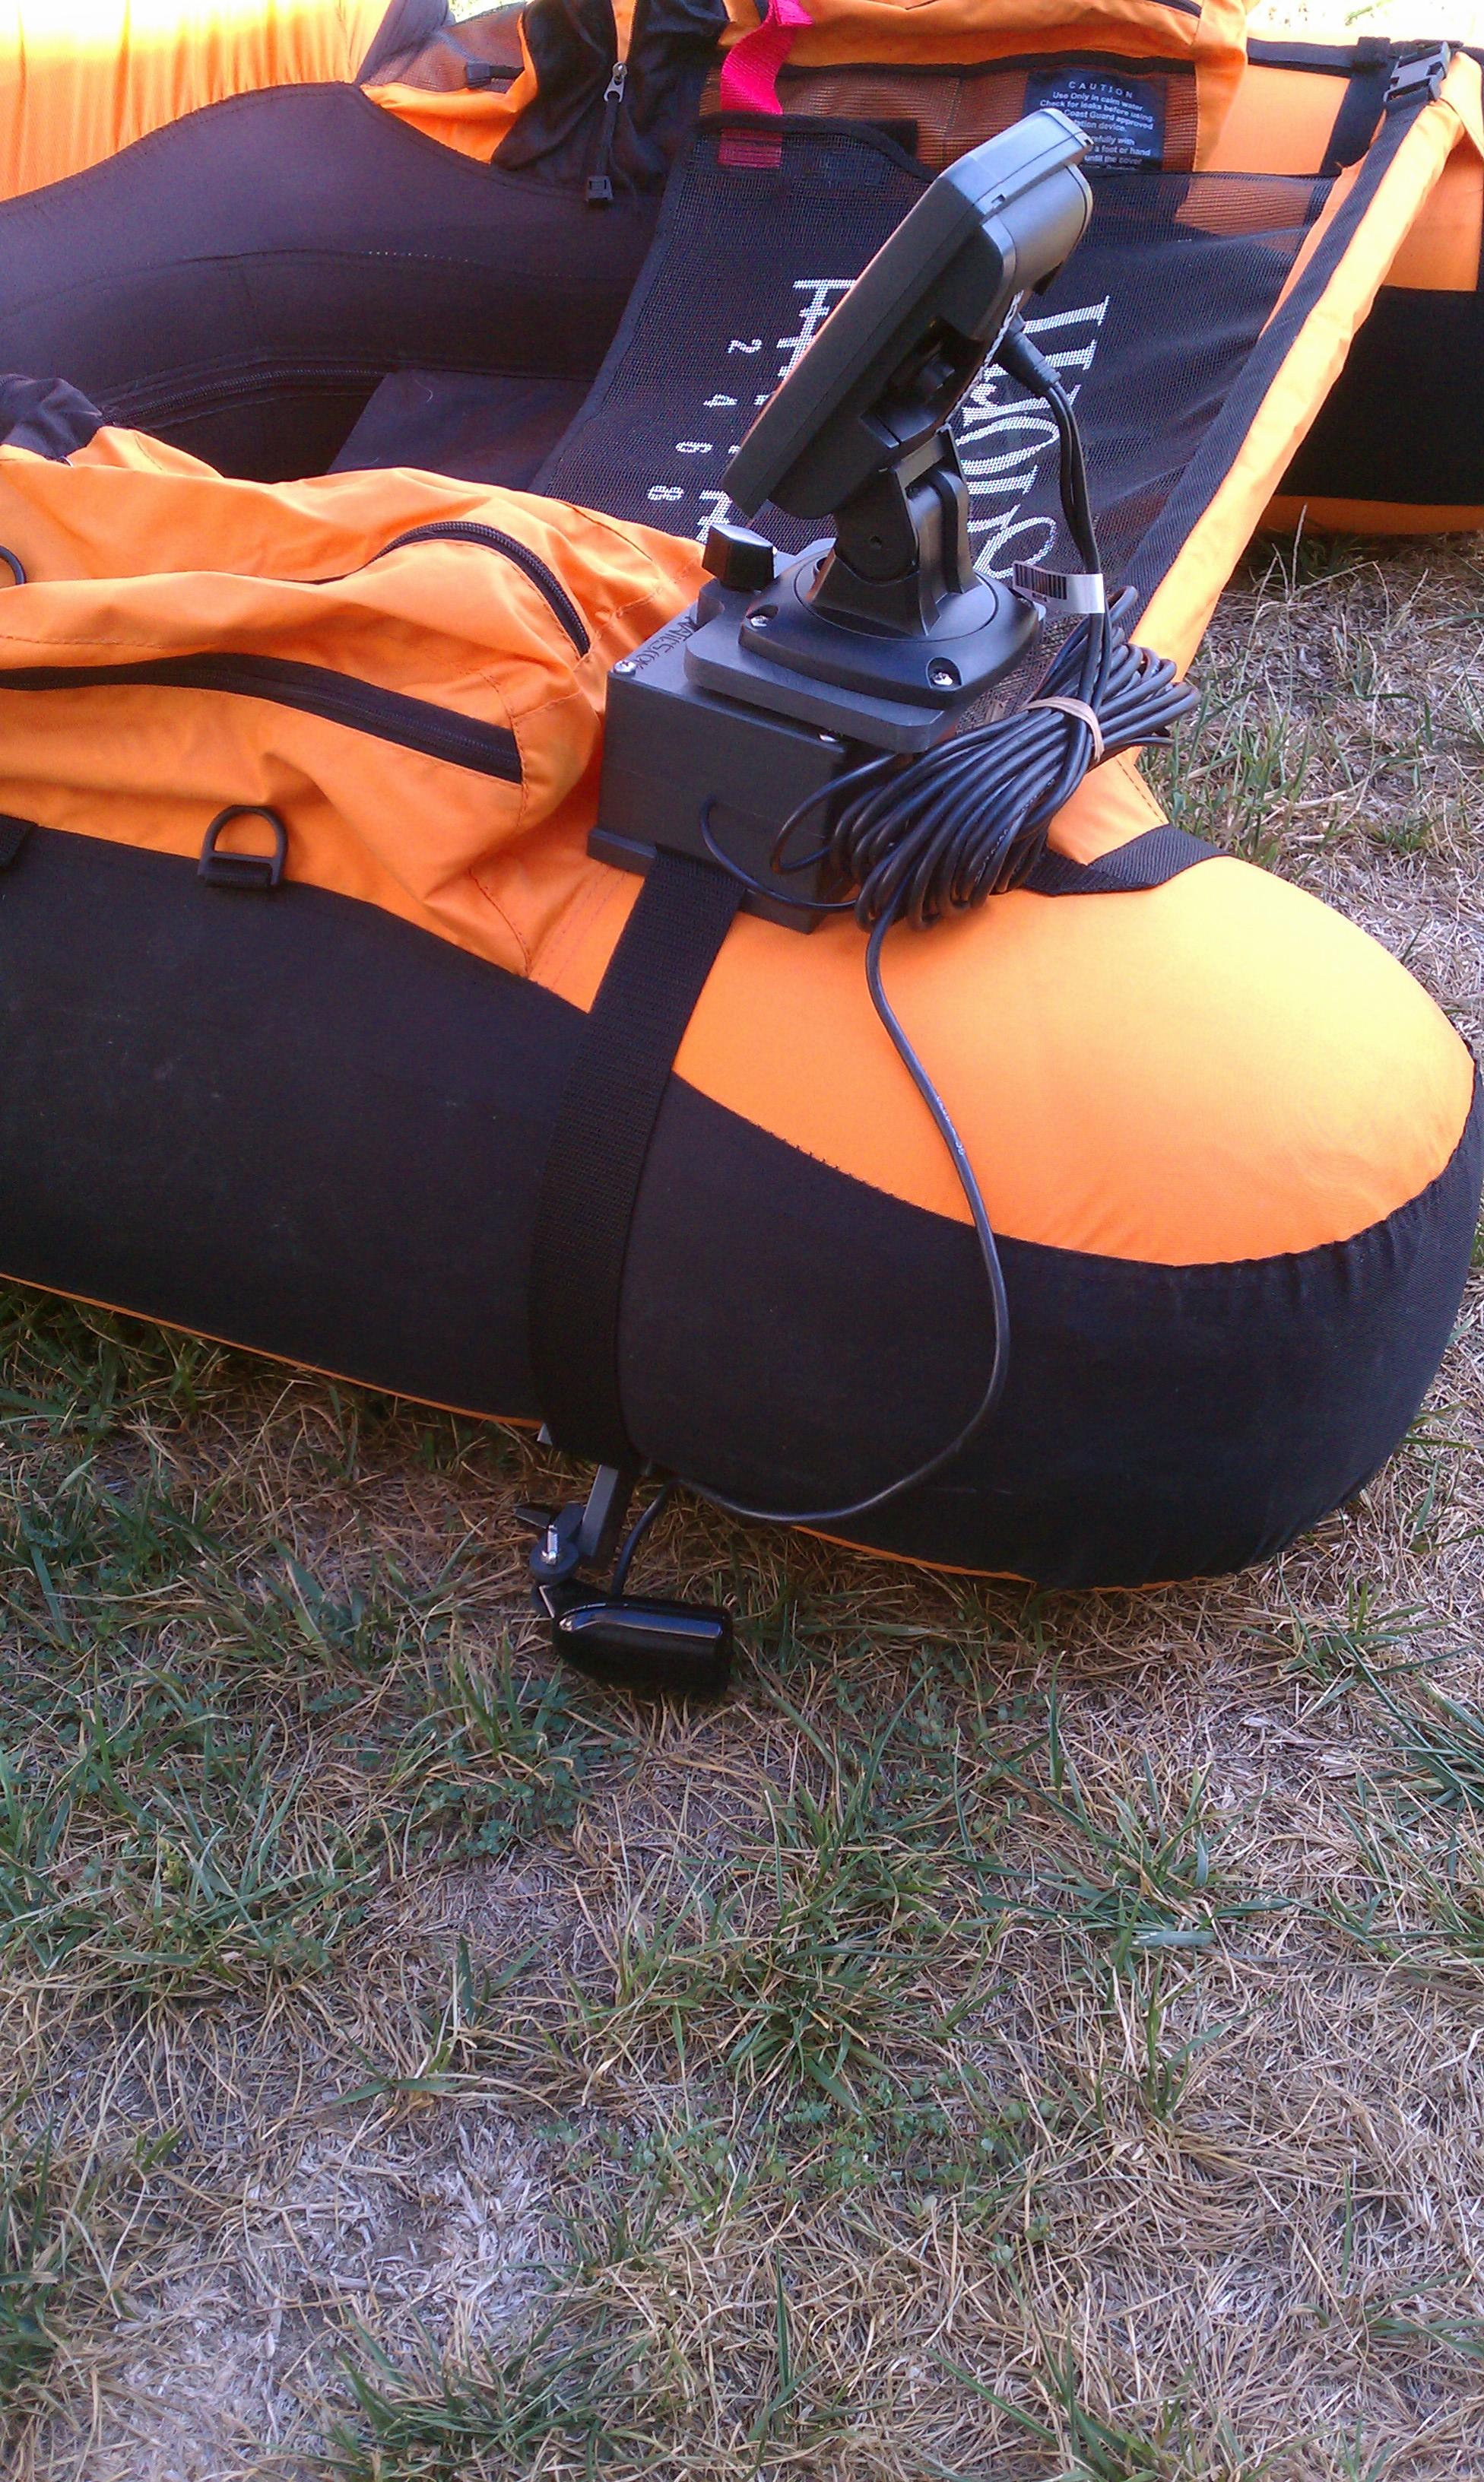 Put a depth sounder on a float tube